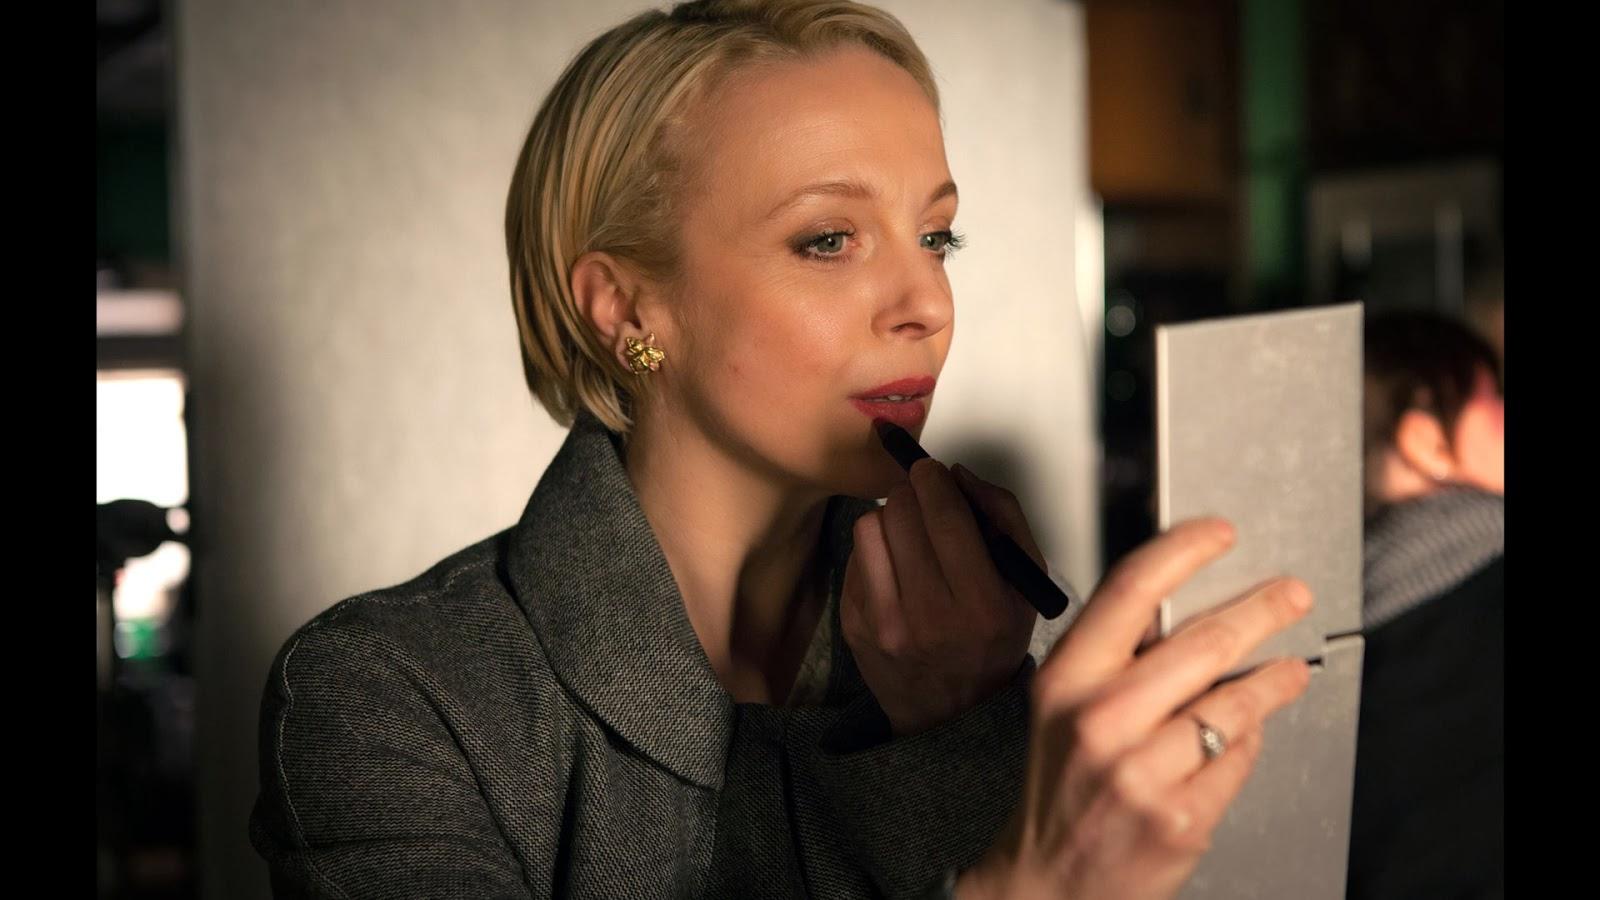 Amanda Abbington as Mary Watson in BBC Sherlock Season 3 Episode 3 His Last Vow